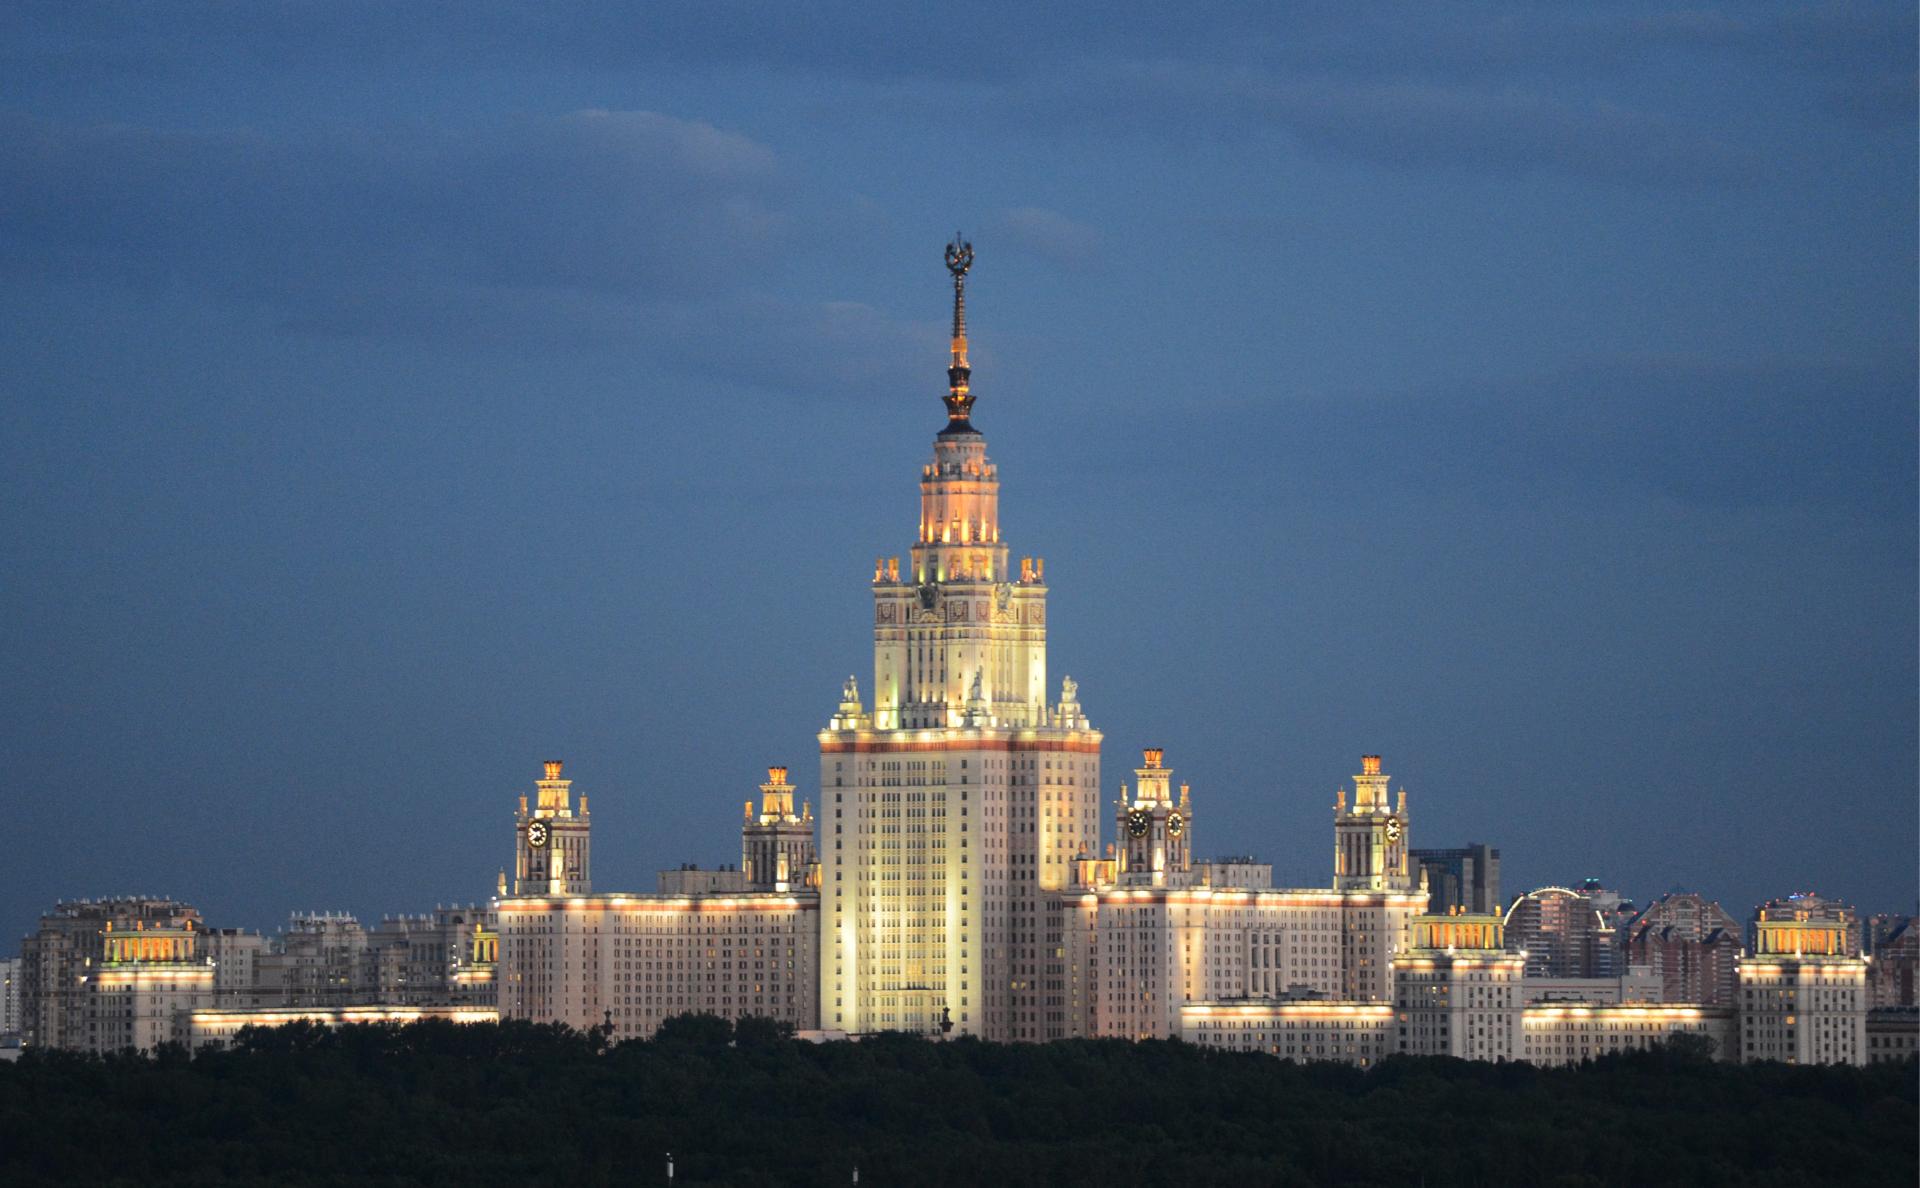 Фото:Евгений Филиппов / РИА Новости